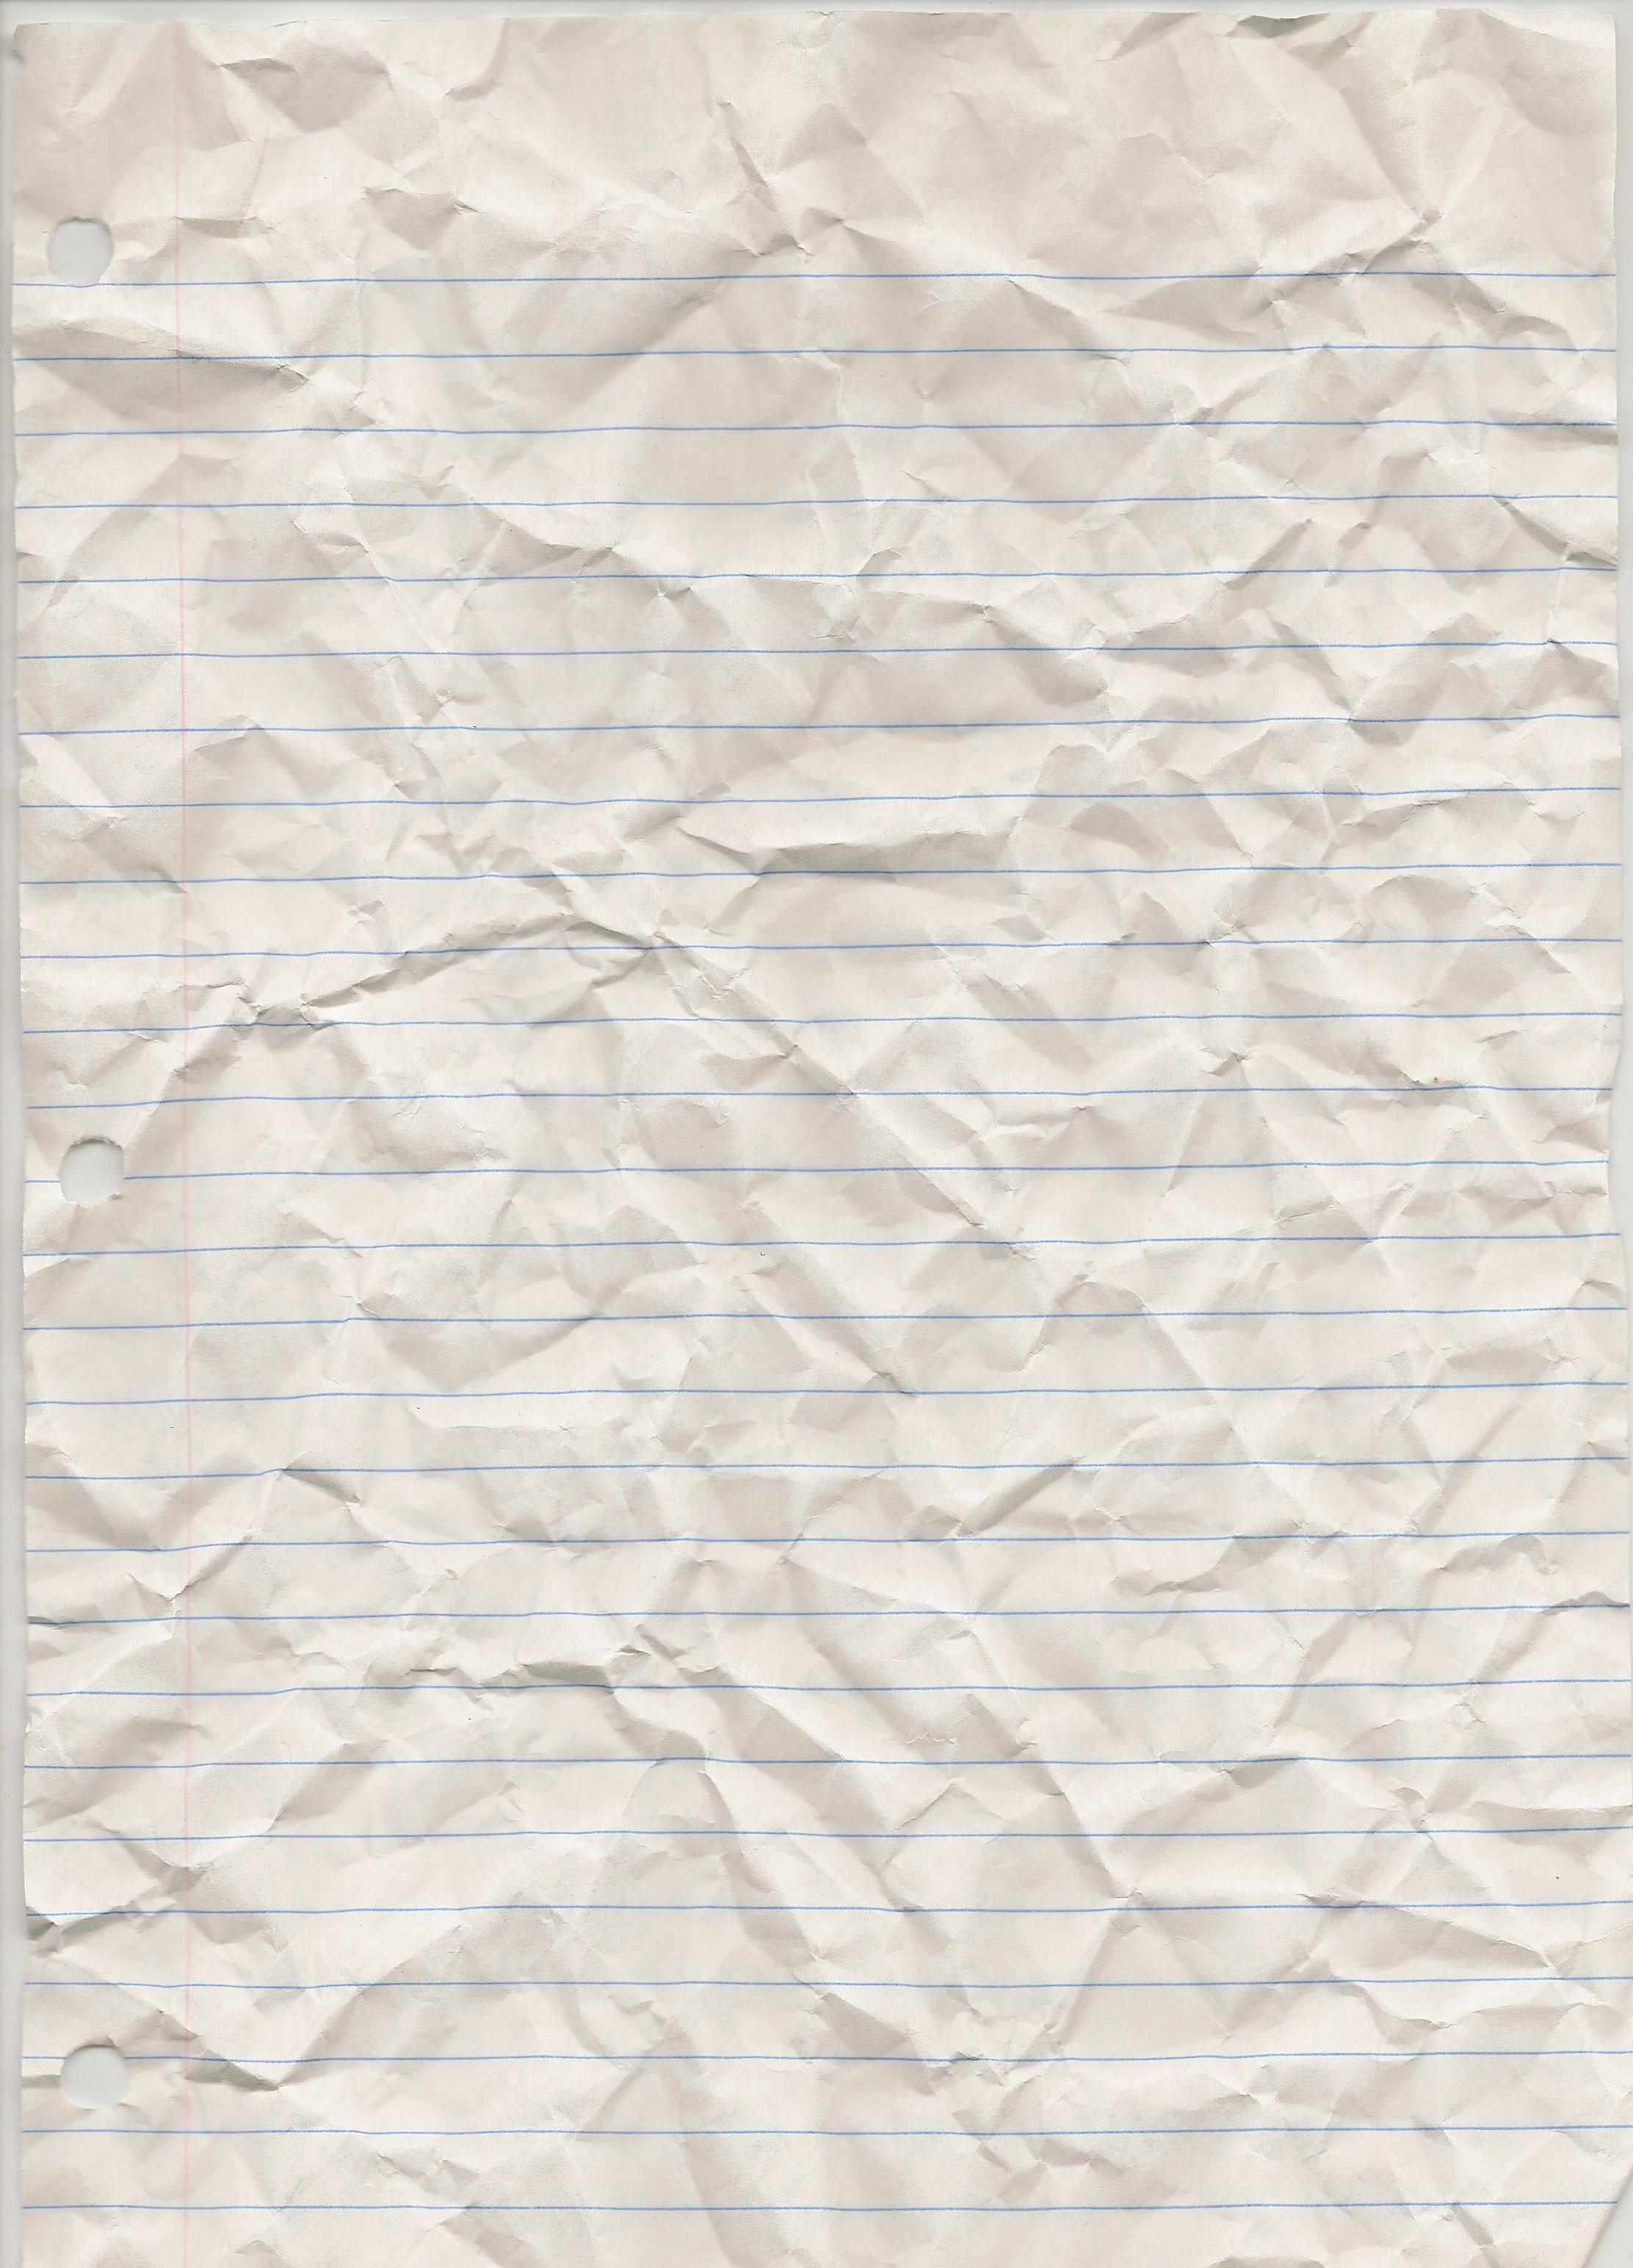 Lined Paper Wallpaper WallpaperSafari – Paper Lined